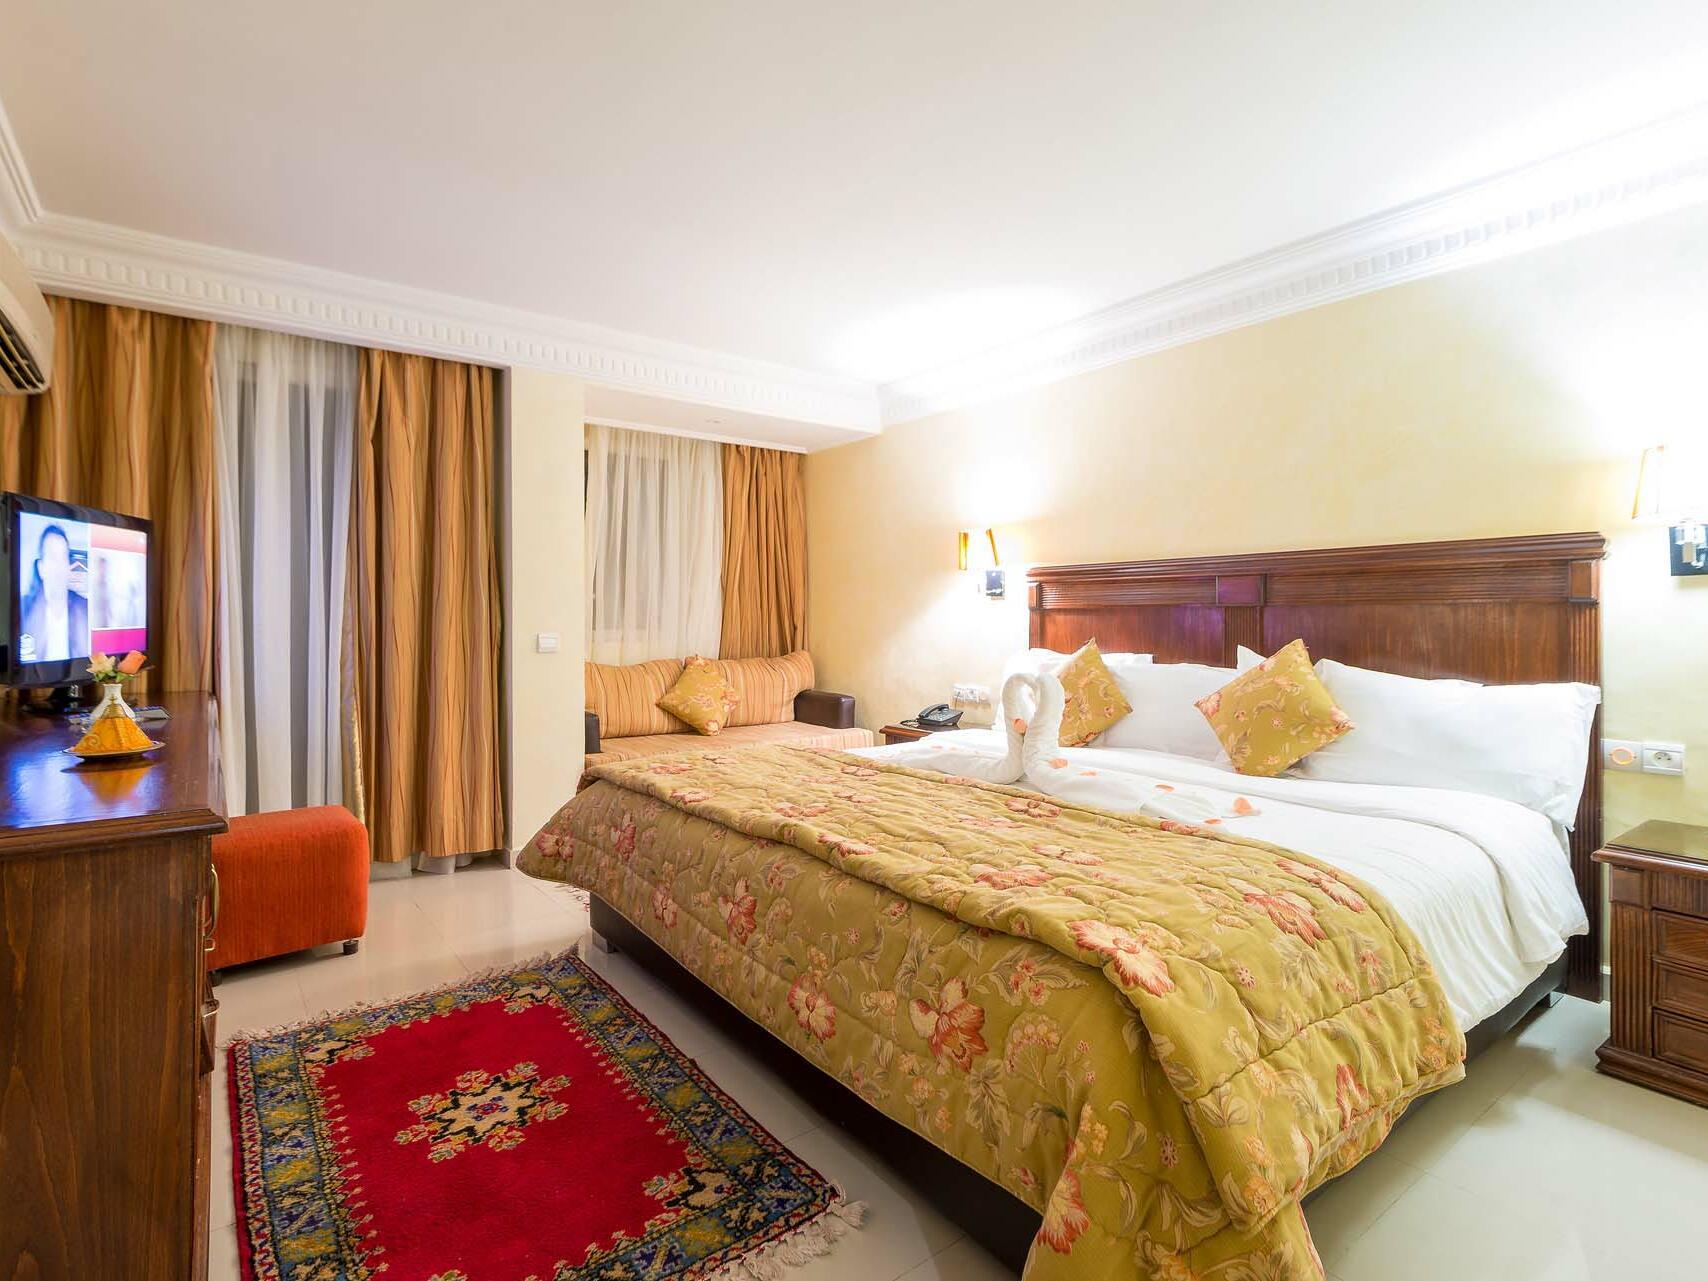 Comfy Queen Size Bed -  Farah Marrakech Hotel